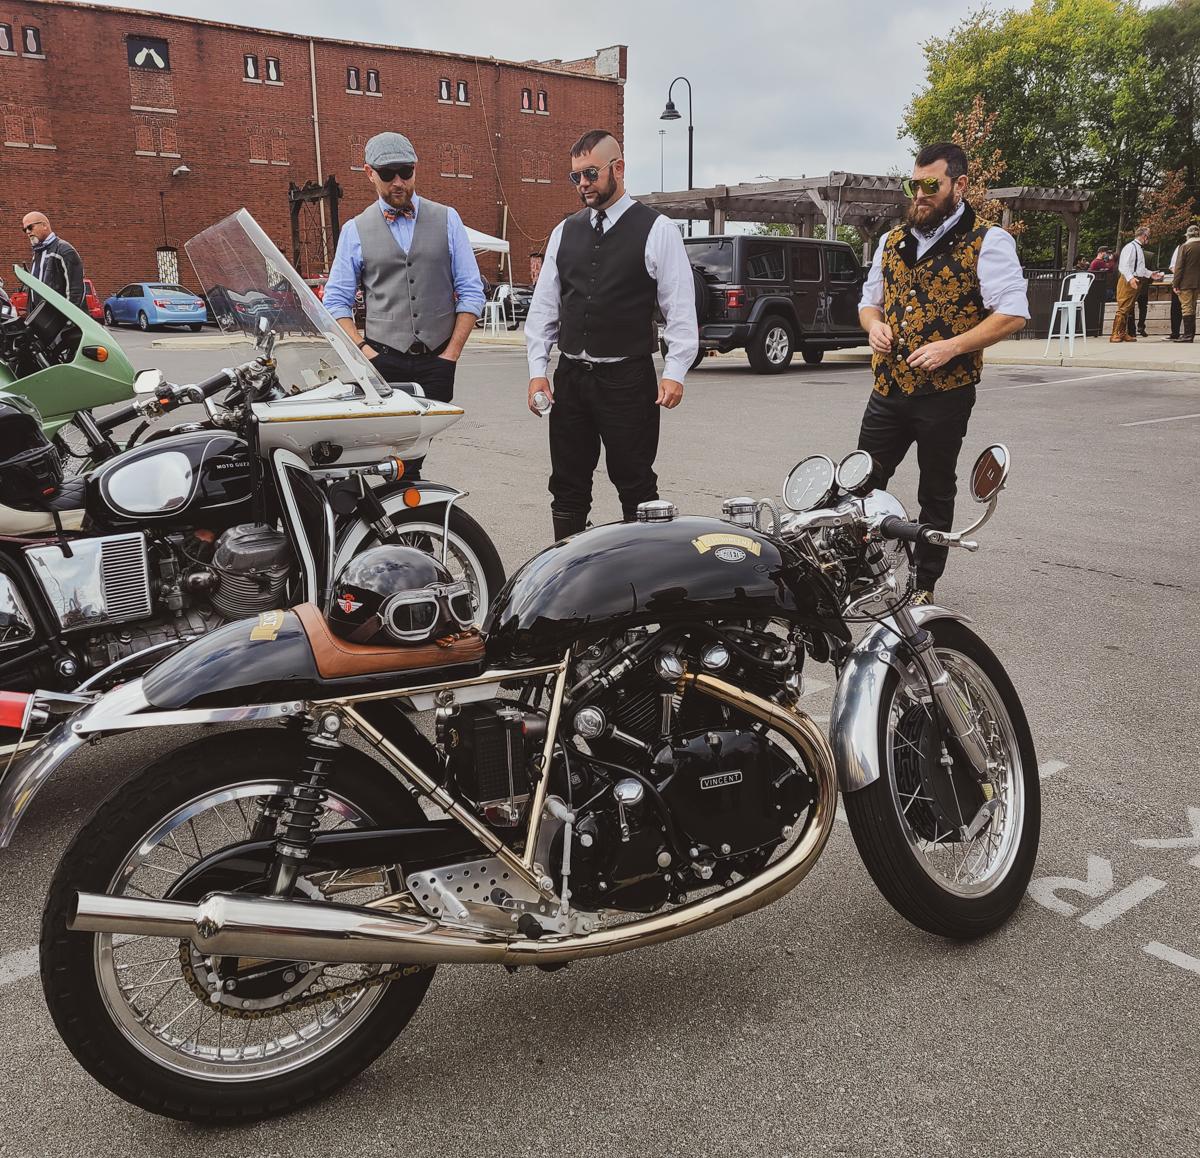 Dapper Ride for Gentlefolk |  September 27, 2020 | Indianapolis, IN. | Photo Credit: ©Pix Meyers 2020